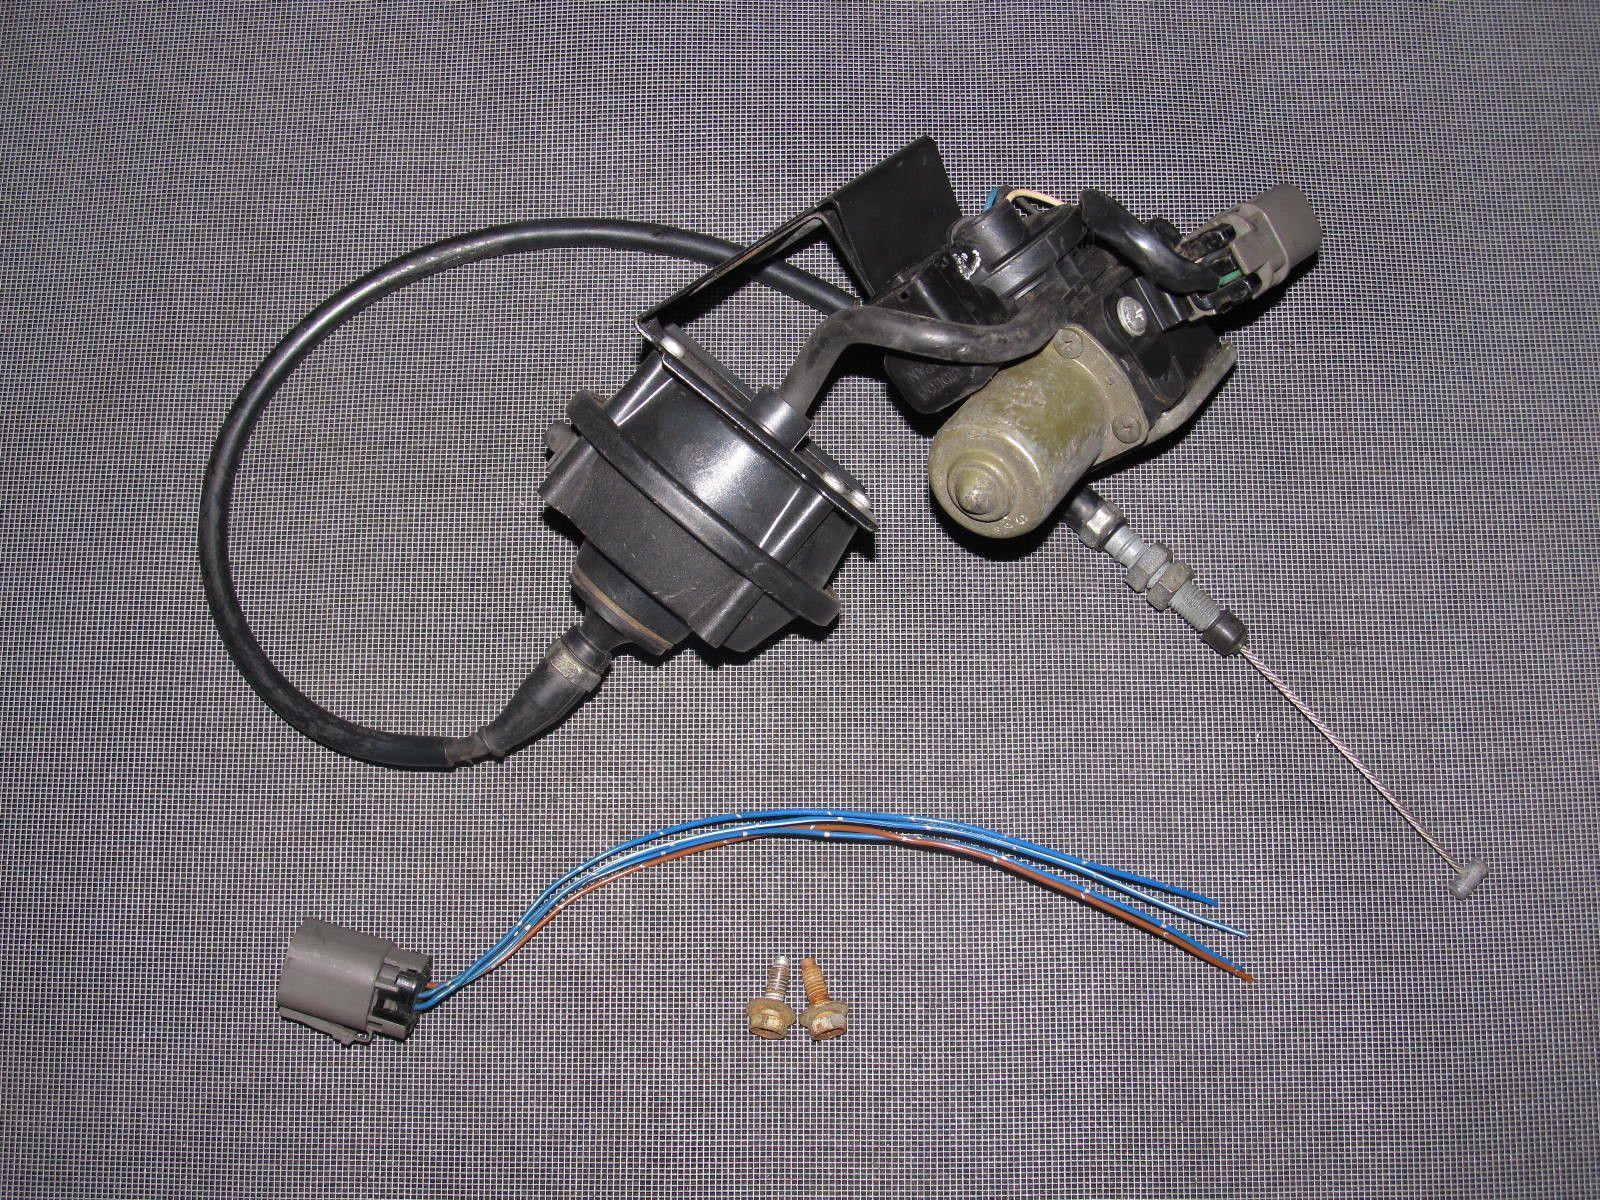 90 96 nissan 300zx cruise control motor actuator cable rh pinterest com